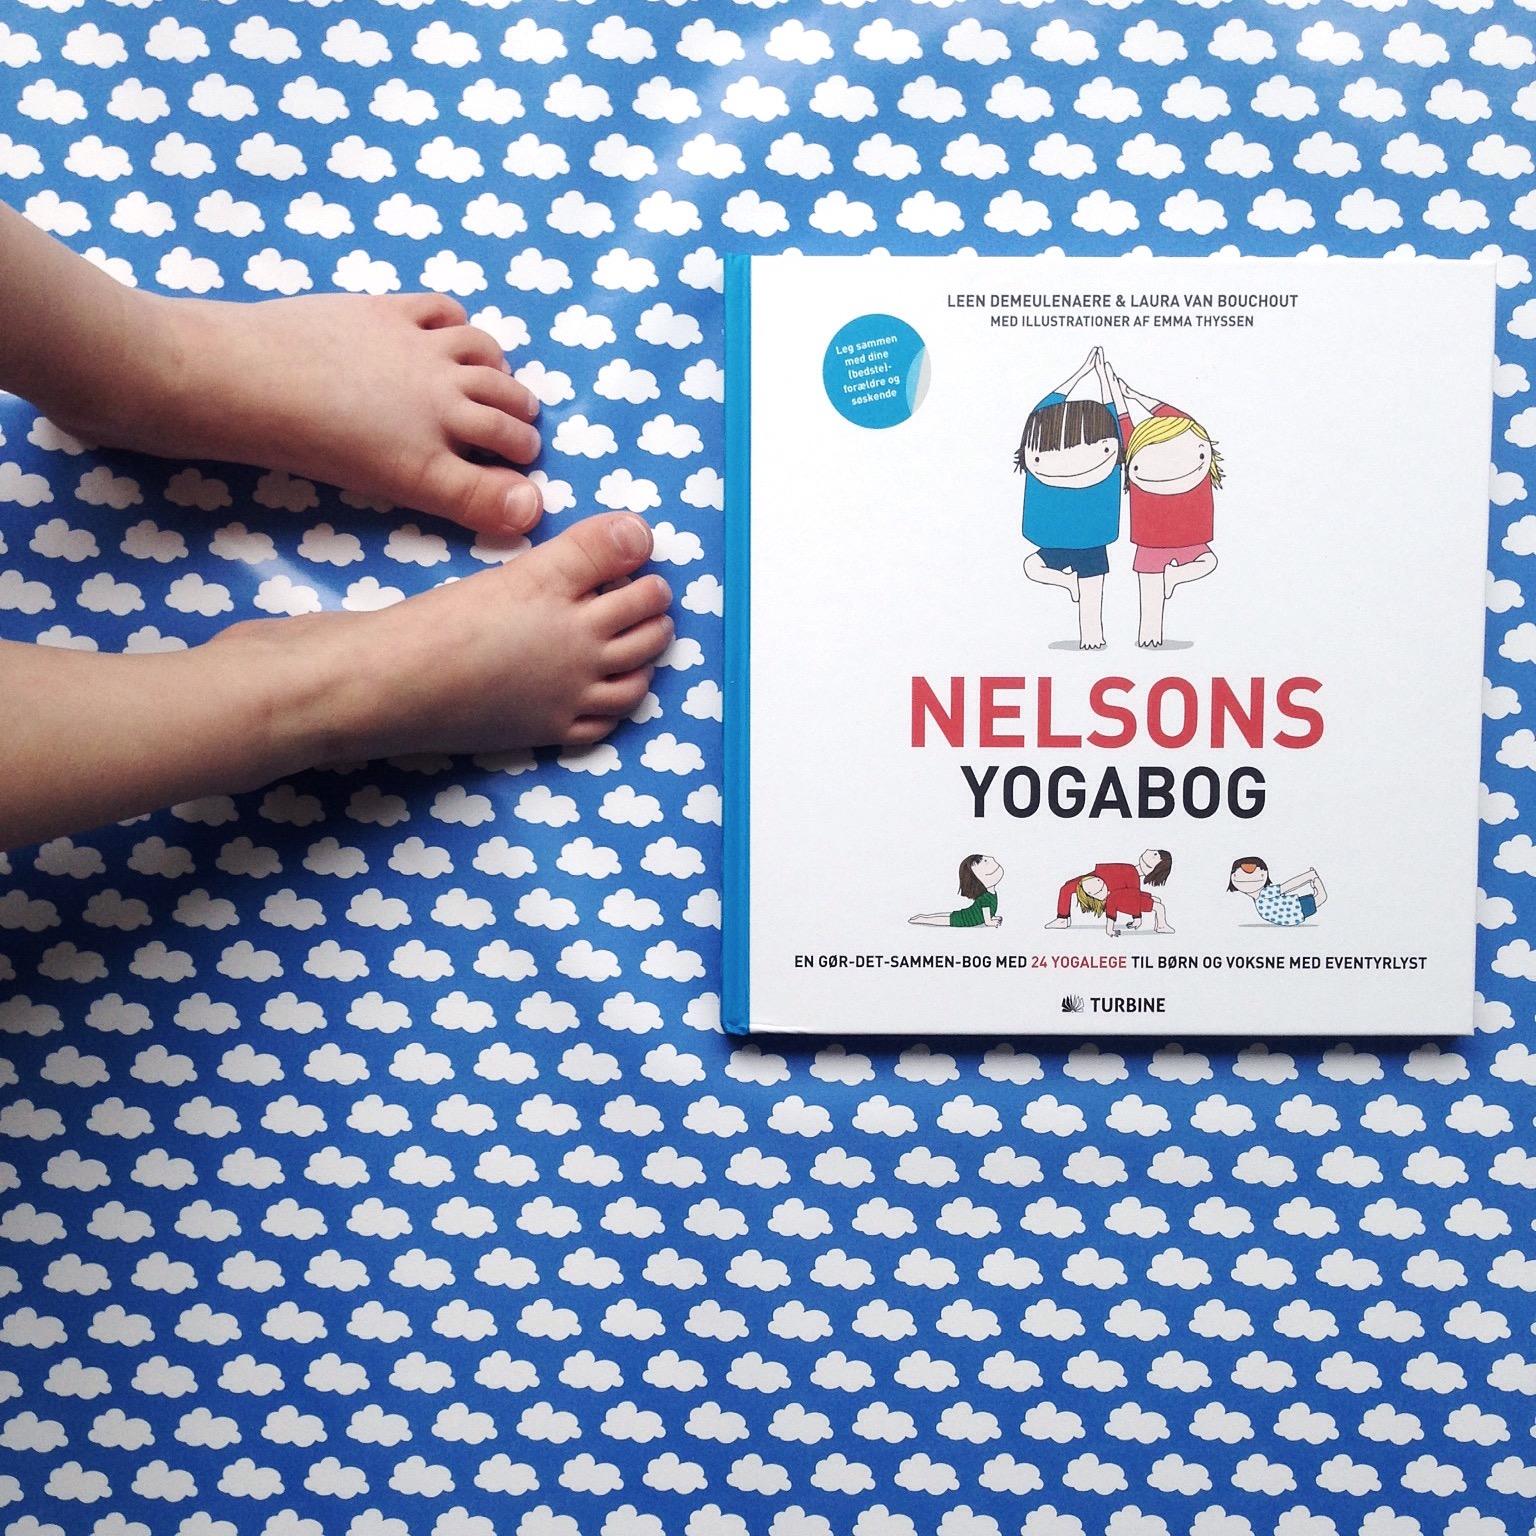 Nelsons yogabog,  Bogoplevelsen, Leen Demeulenaere , Laura van Bouchout